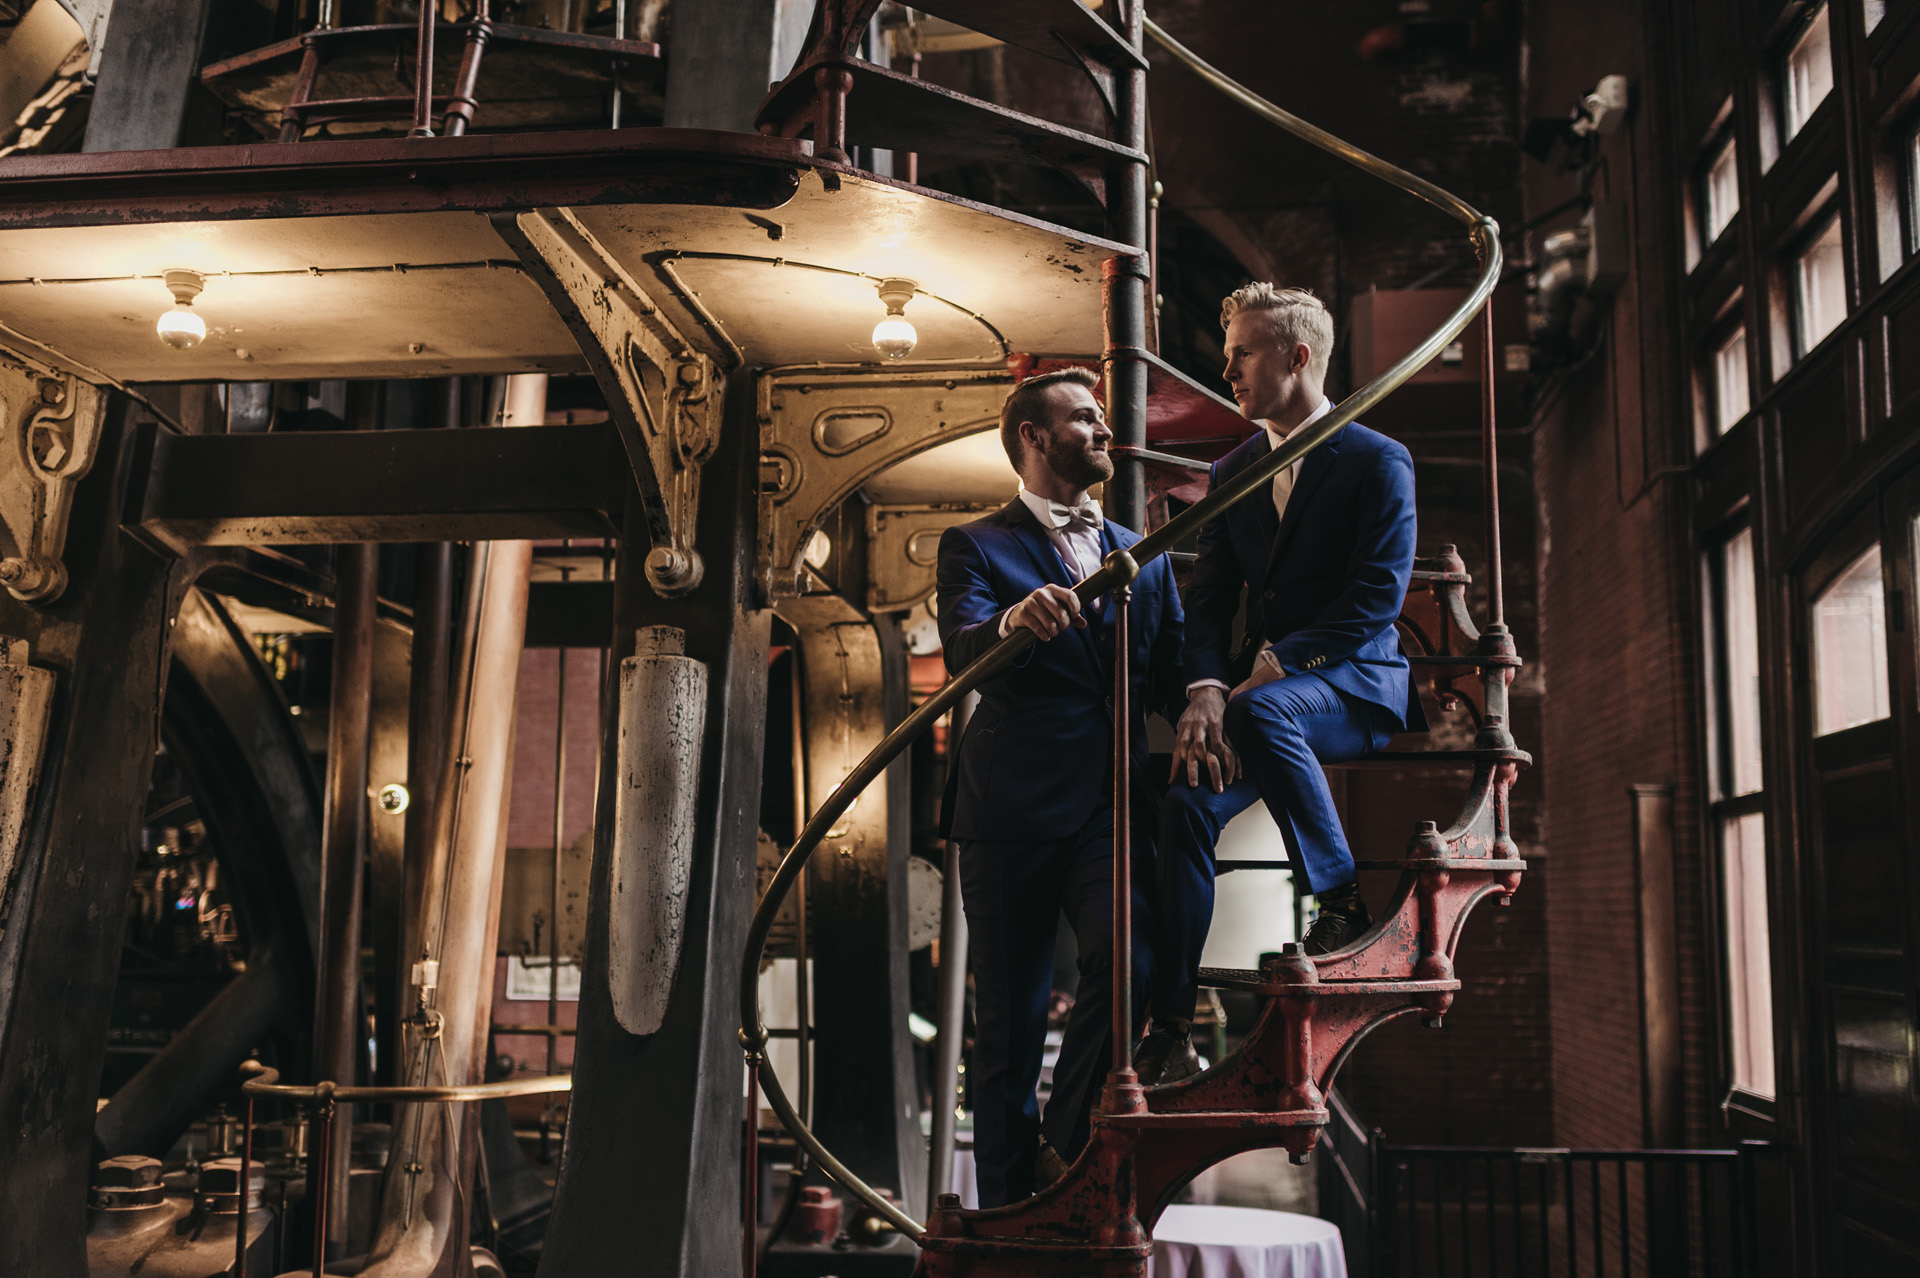 boston-waterworks-museum-wedding-17